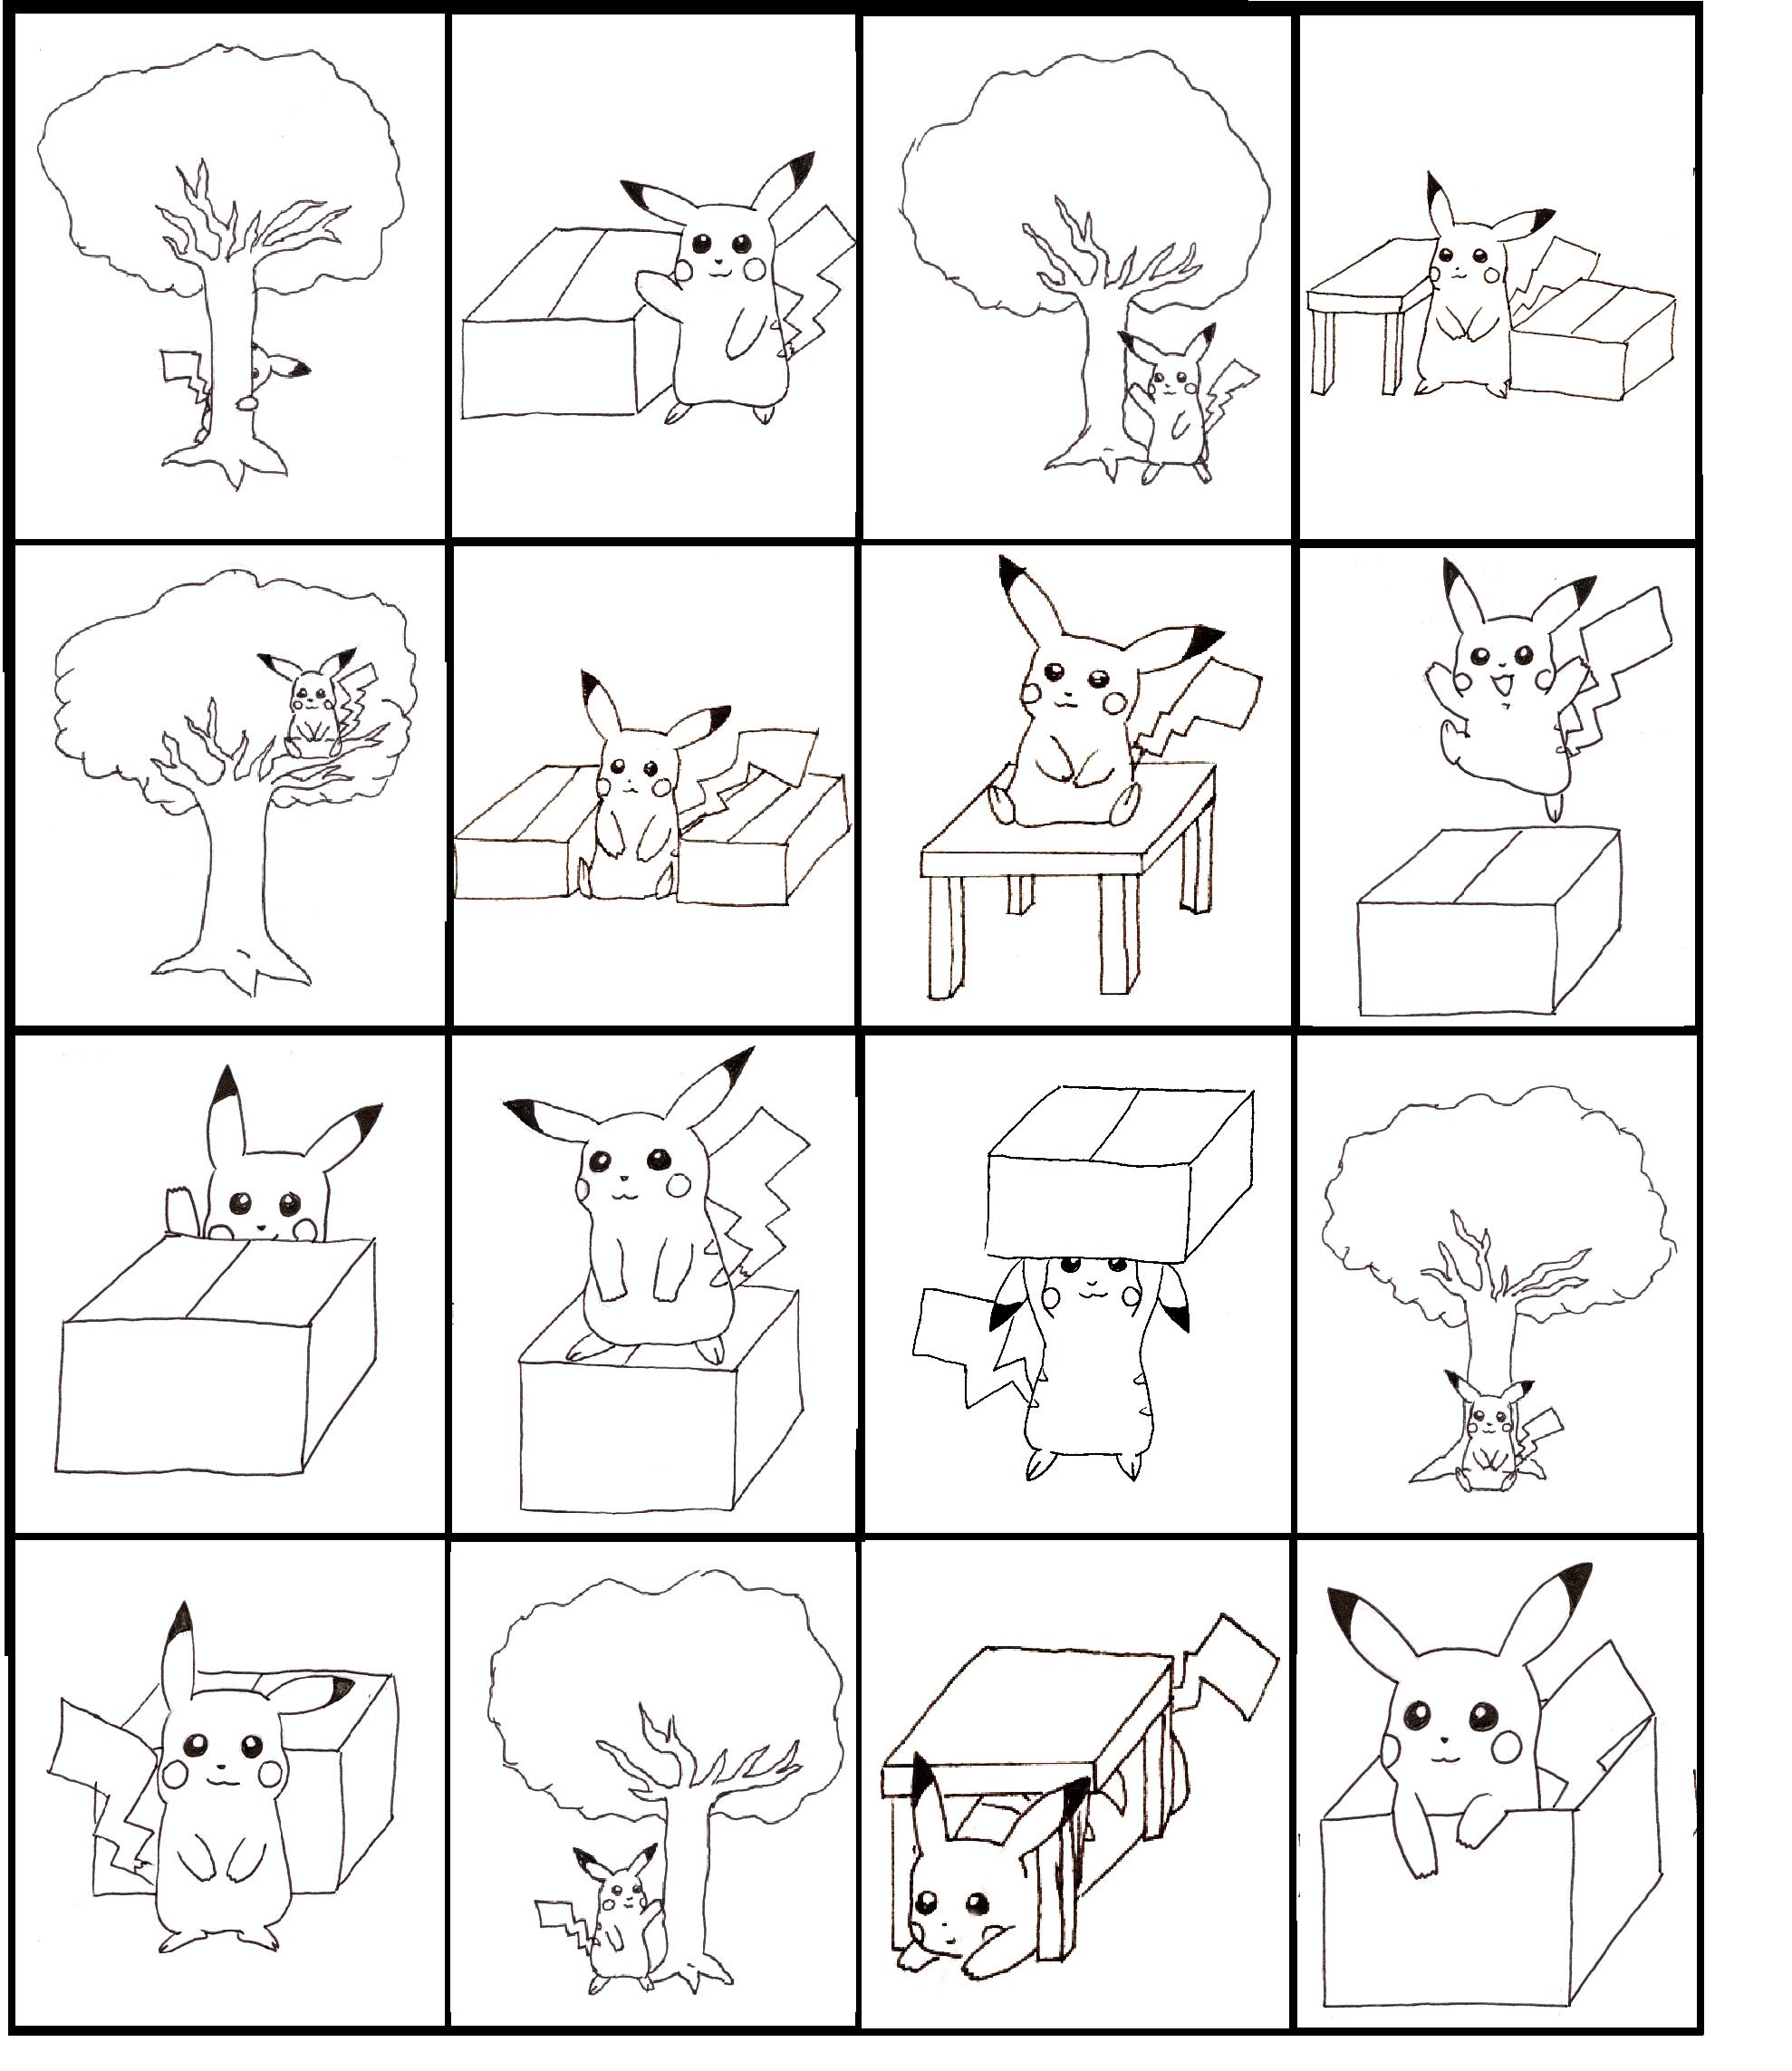 Pikachu Bingo Practicing Prepositions Board 2 Of 4 Made